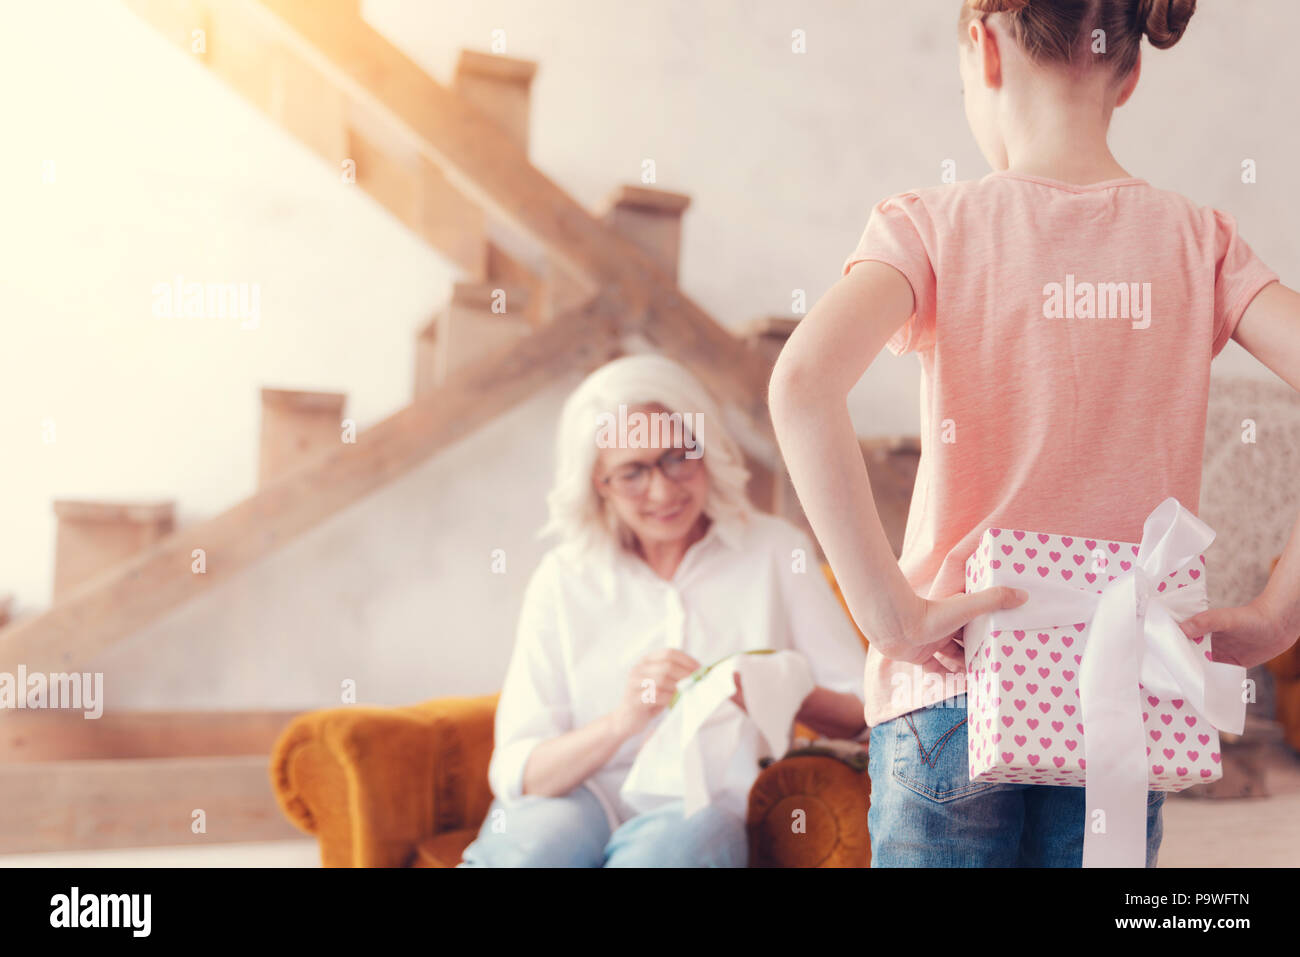 Wunderschön Verpackt Stockfotos & Wunderschön Verpackt Bilder - Alamy